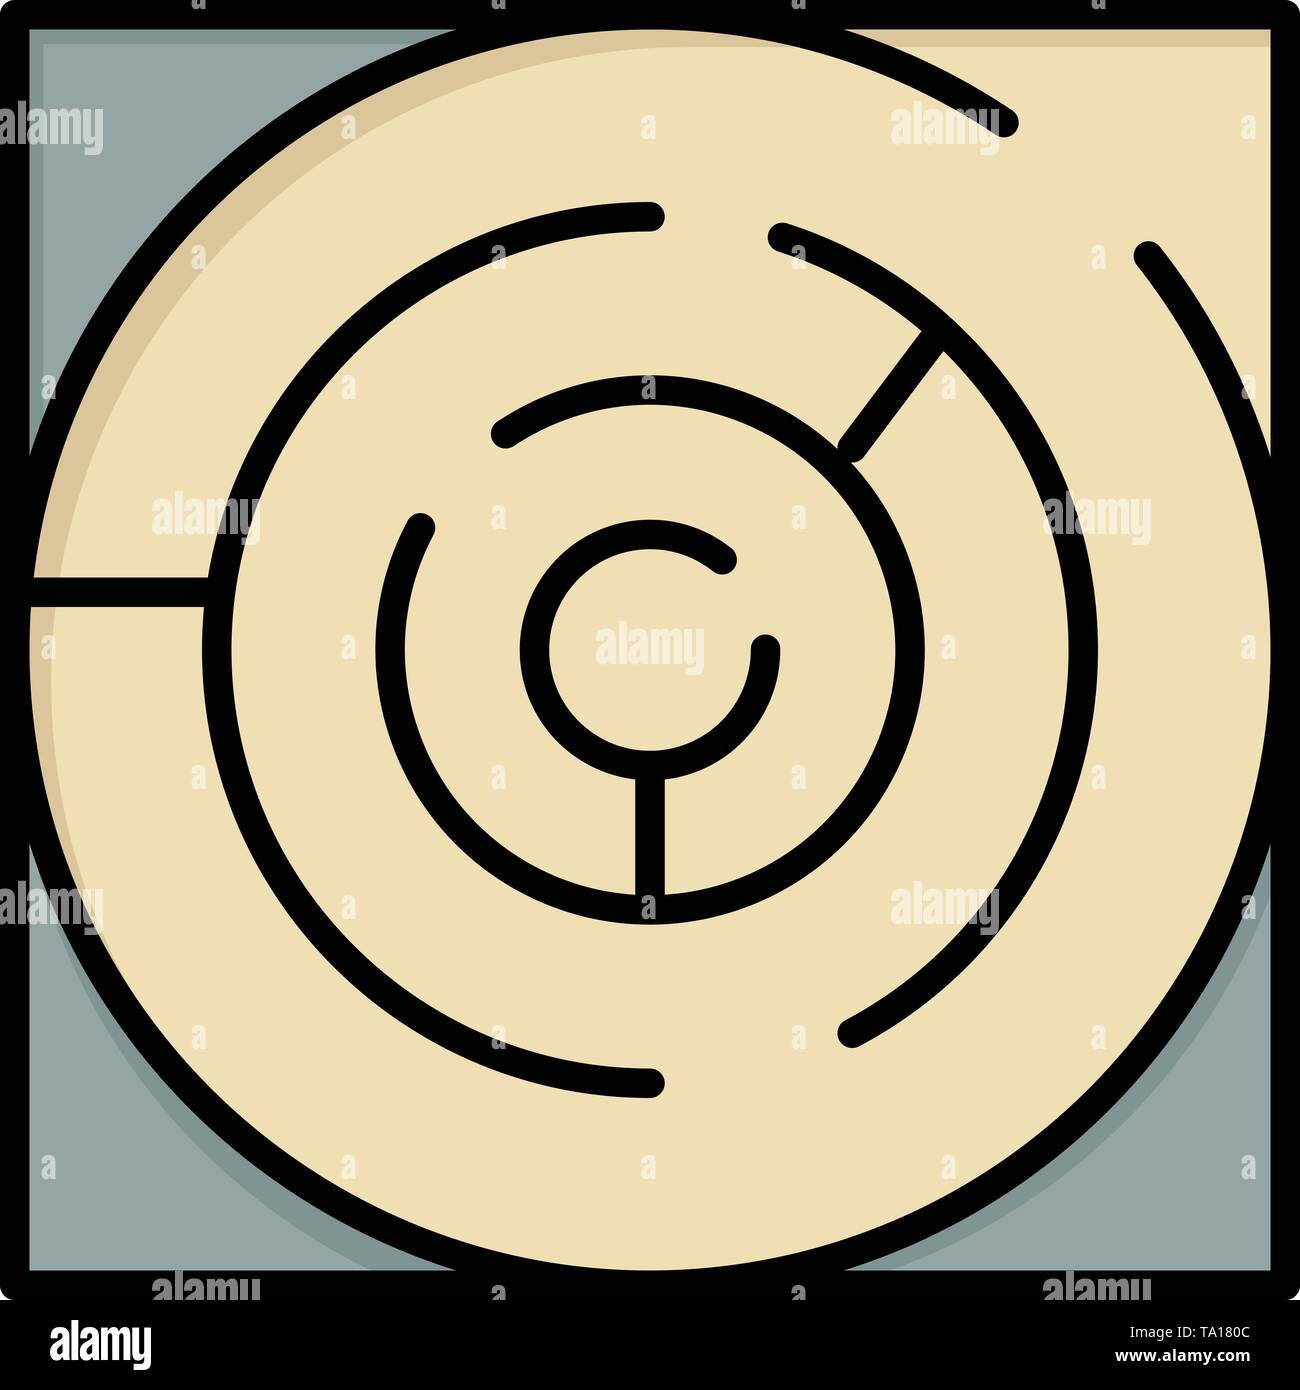 Labyrinth, Karte, Labyrinth, Strategie, Muster flachen Farbe Symbol. Vektor icon banner Vorlage Stockbild